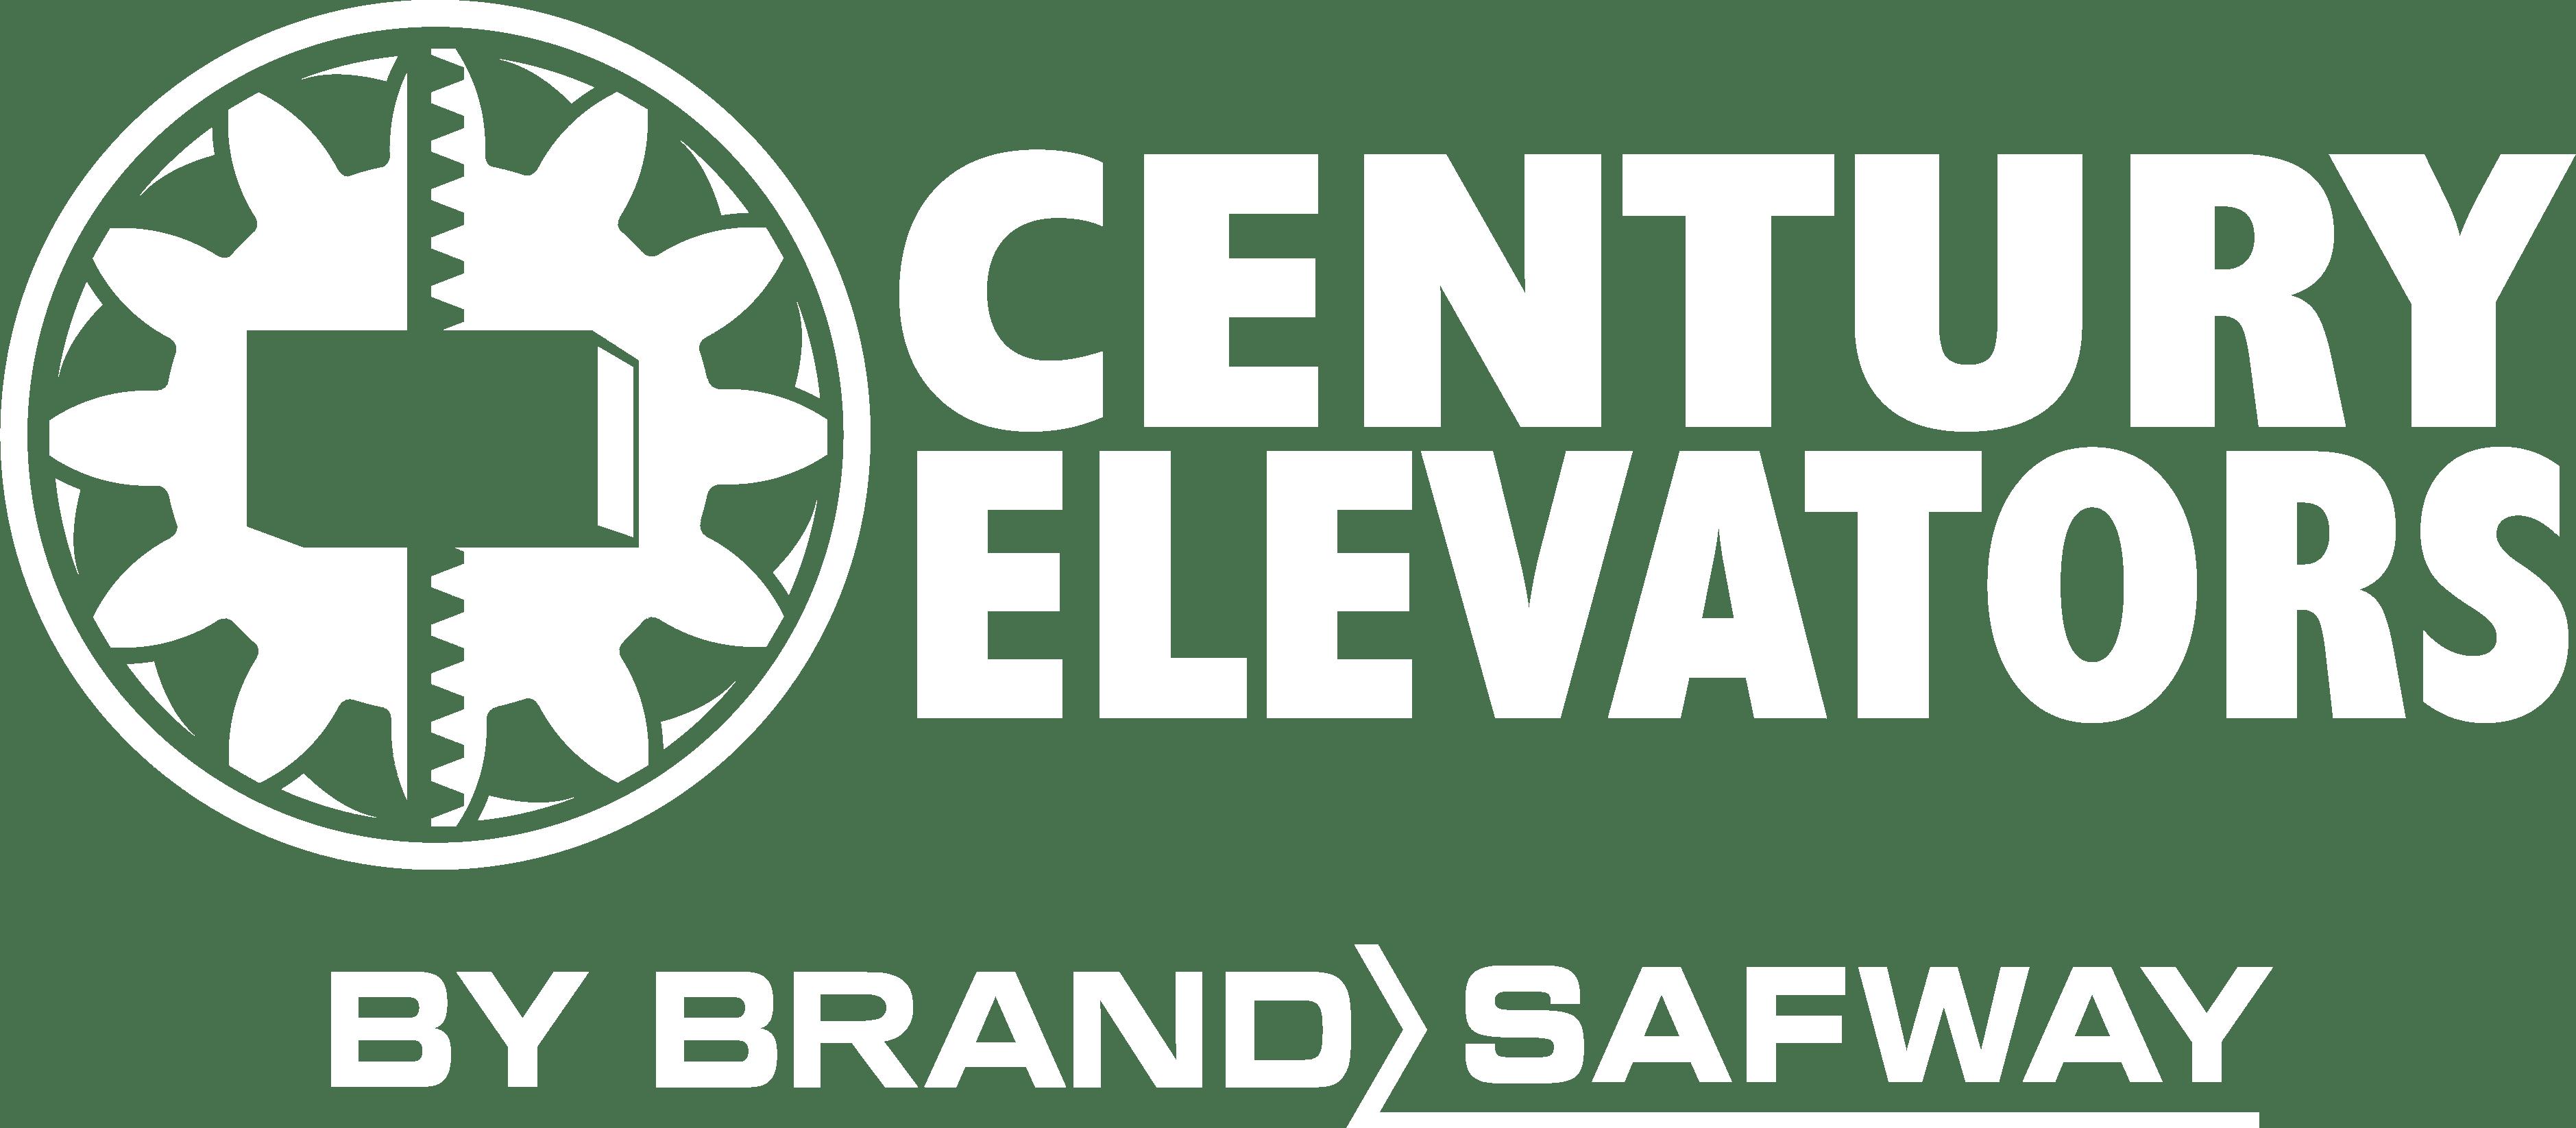 Construction Hoists & Elevators - Temporary Construction Elevators